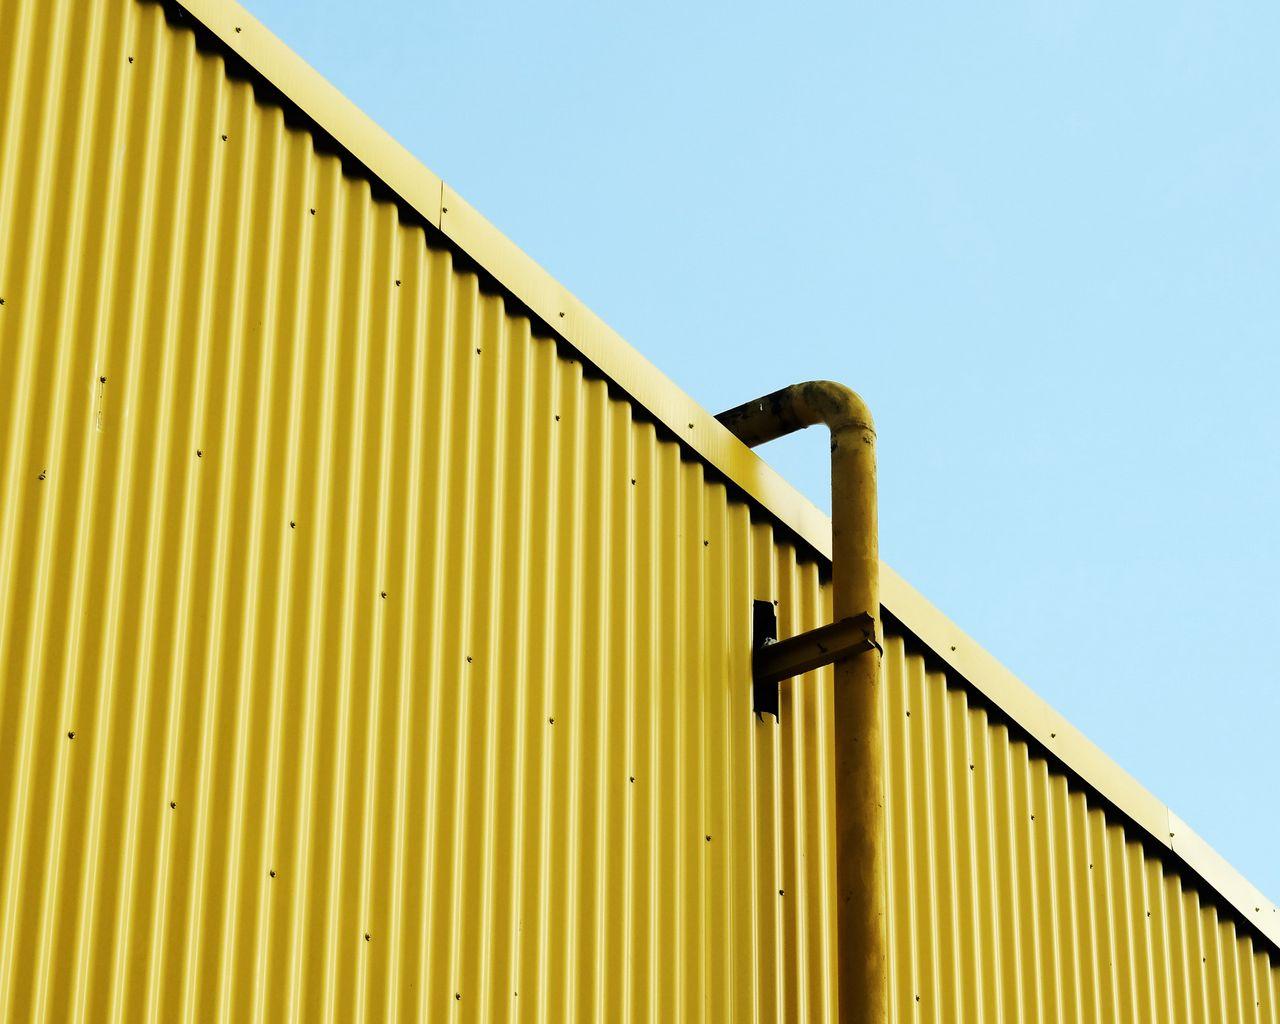 1280x1024 Wallpaper building, pipe, yellow, minimalism